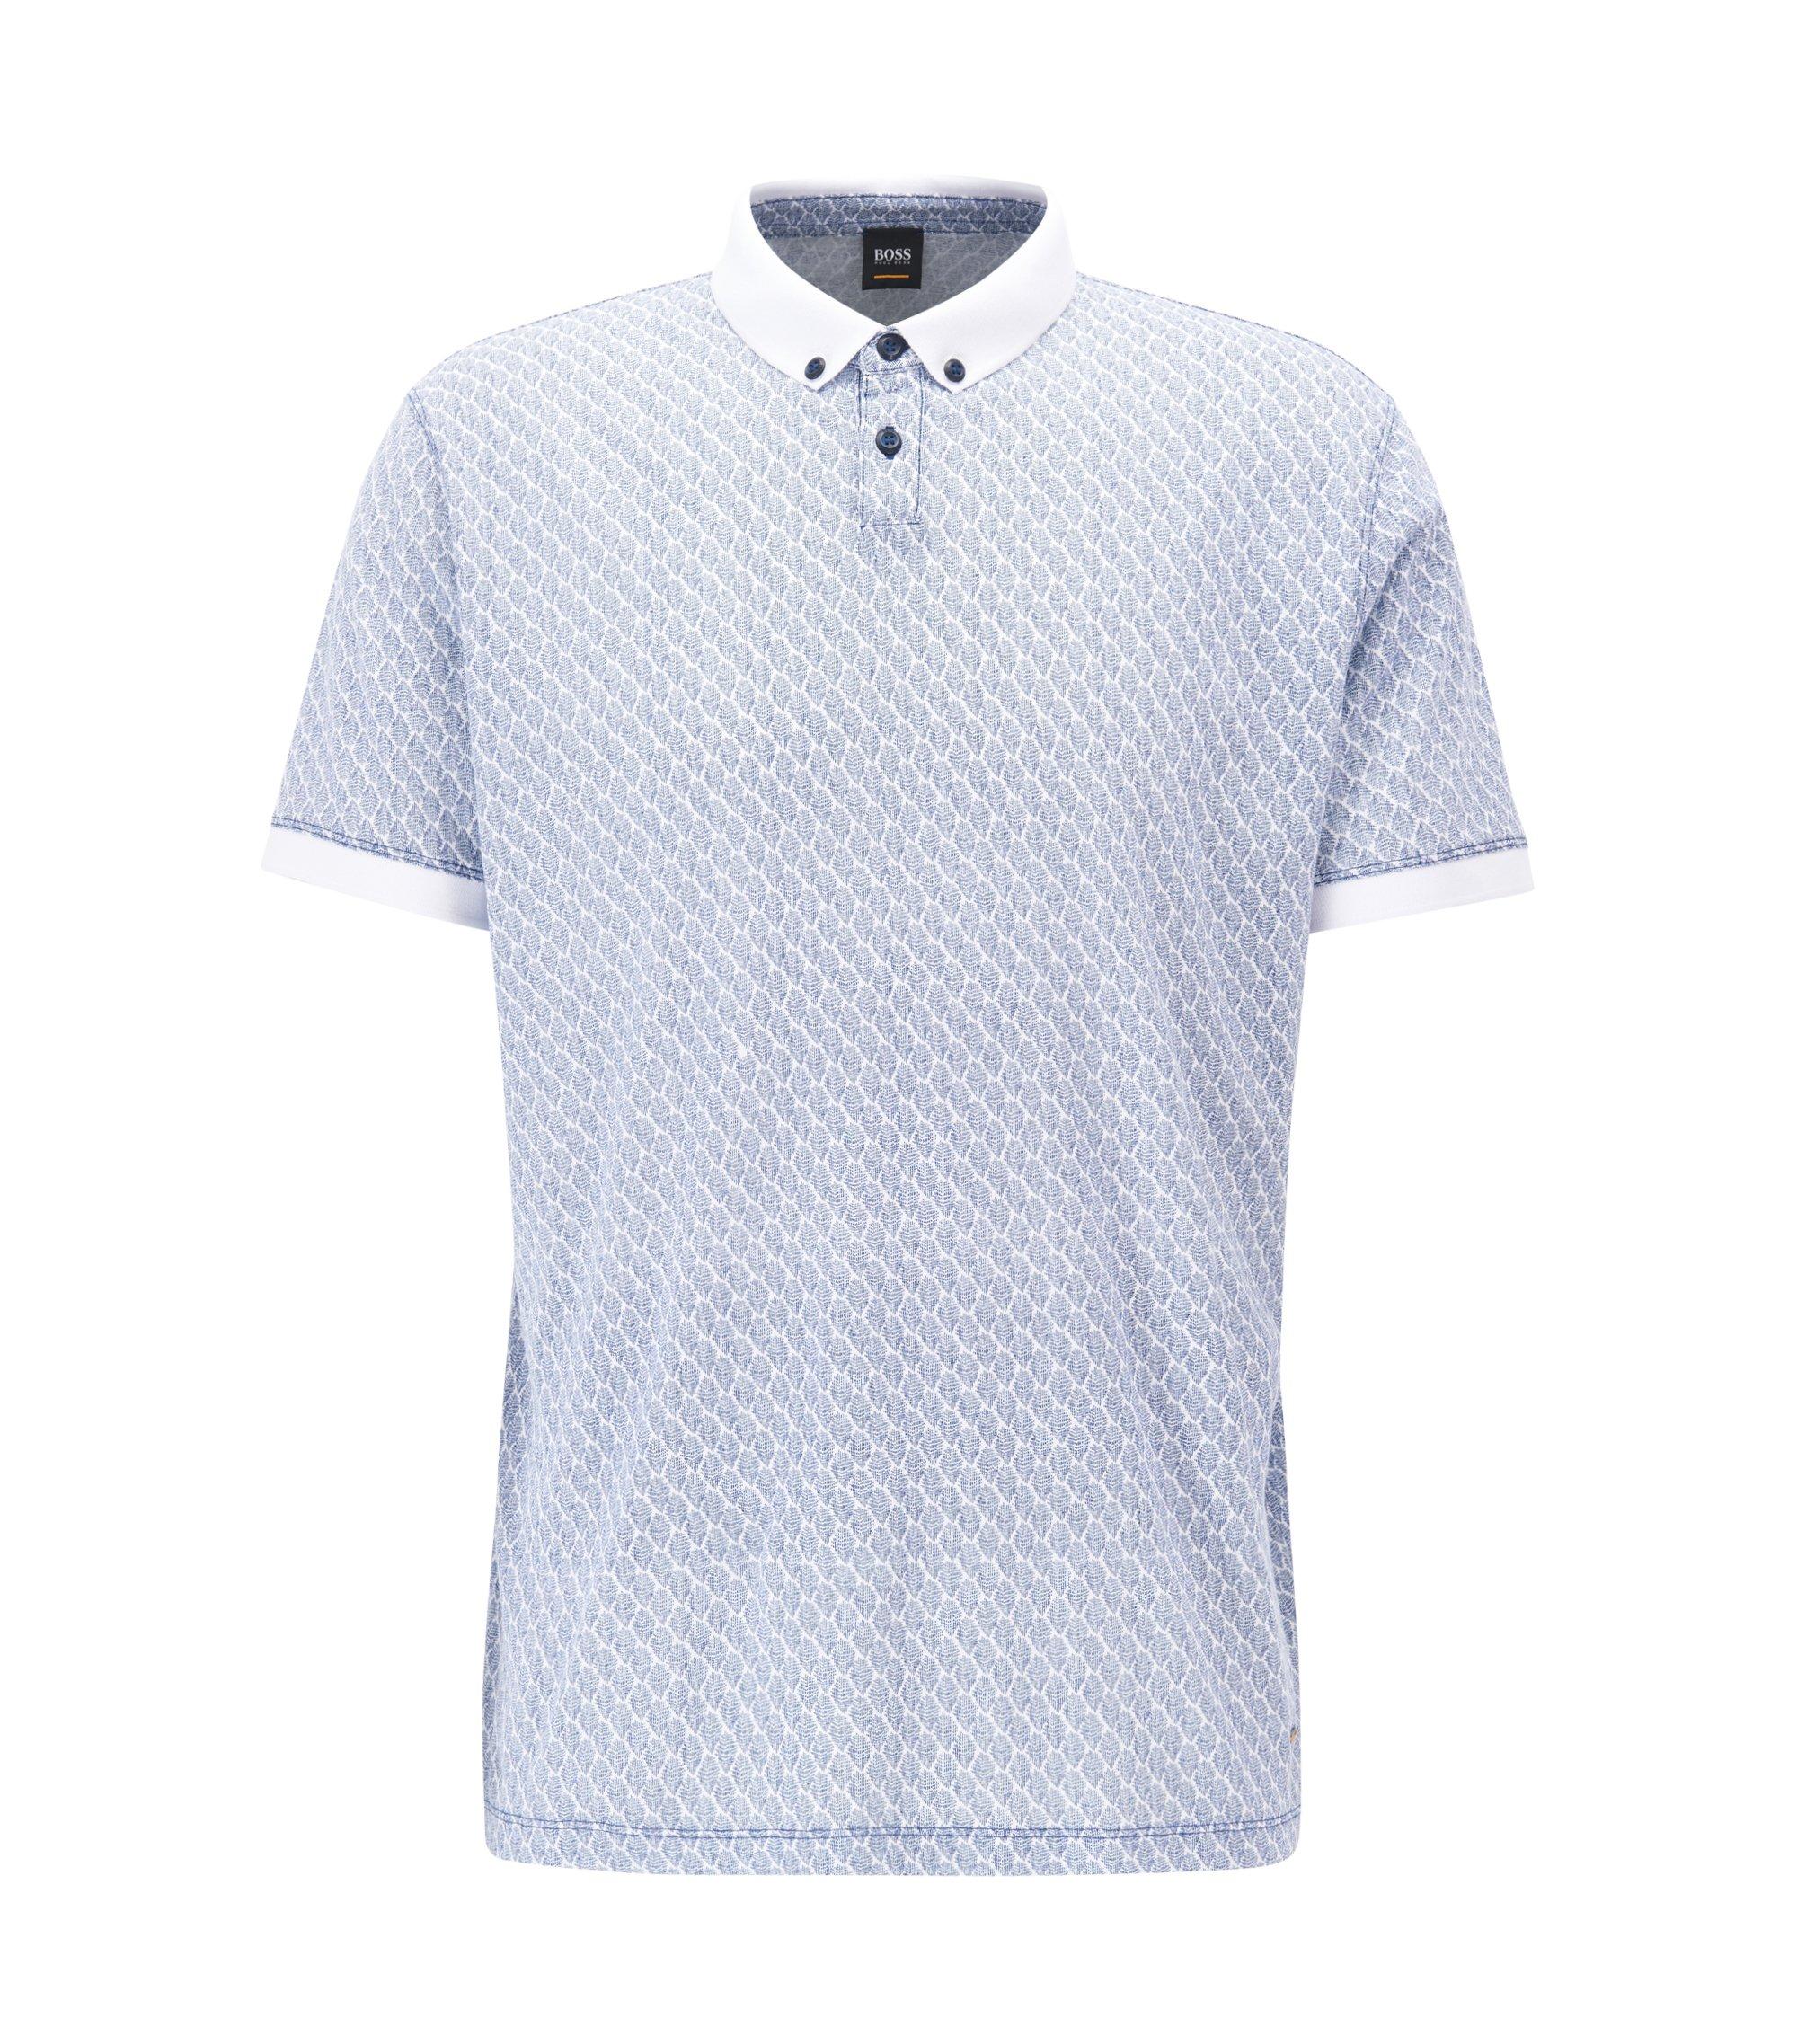 Gemustertes Poloshirt aus Baumwolle, Hellblau